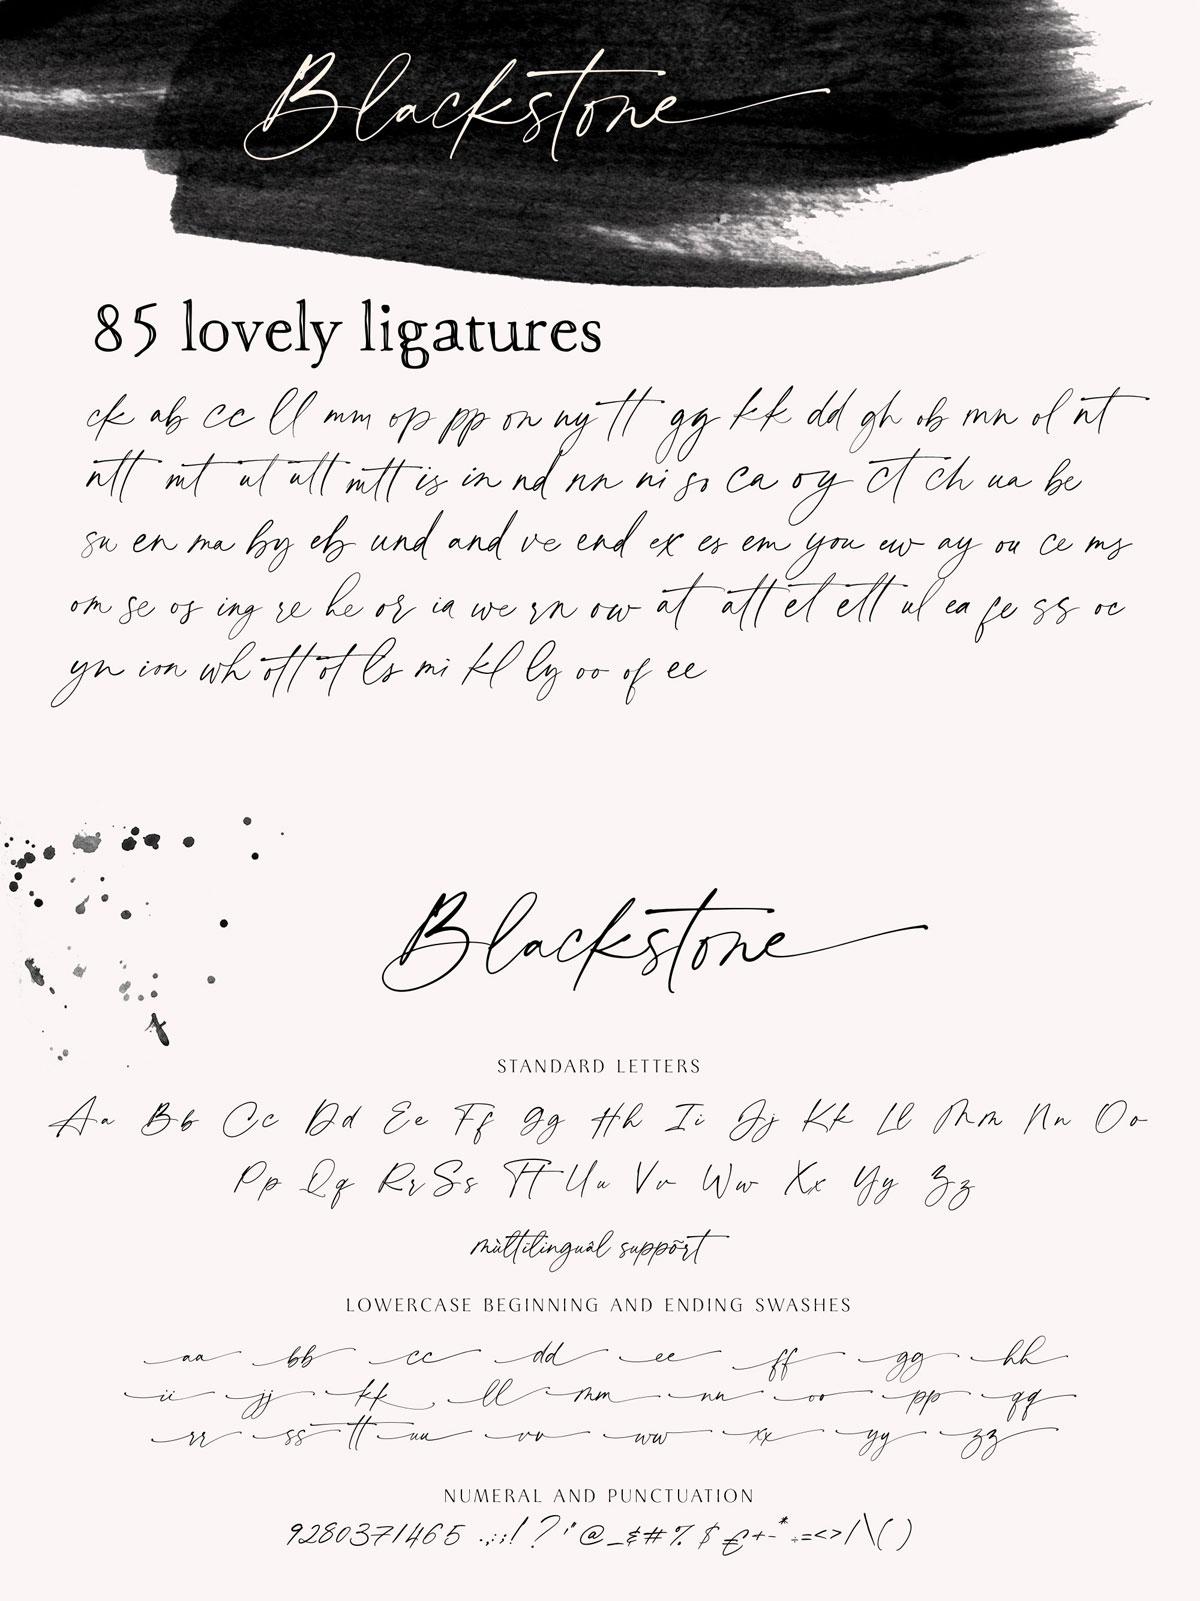 Blackstone Font: Modern & Elegant Calligraphy Typeface